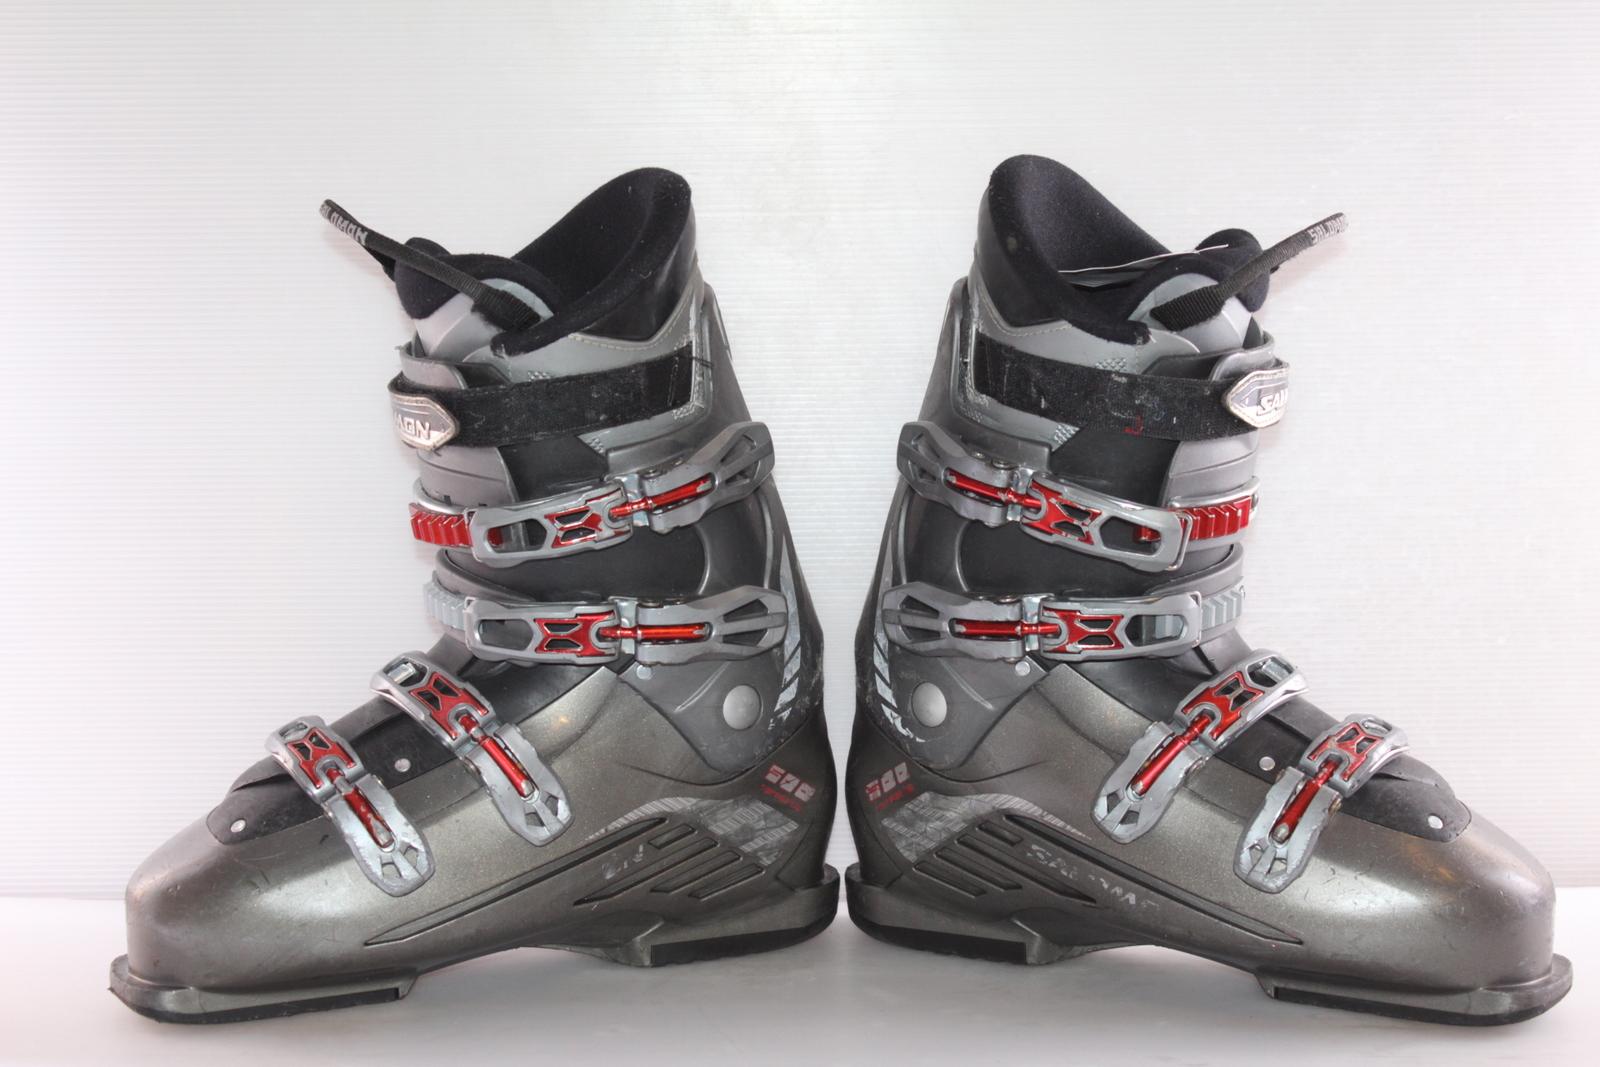 Lyžařské boty Salomon Performa 500 vel. EU44.5 flexe 70